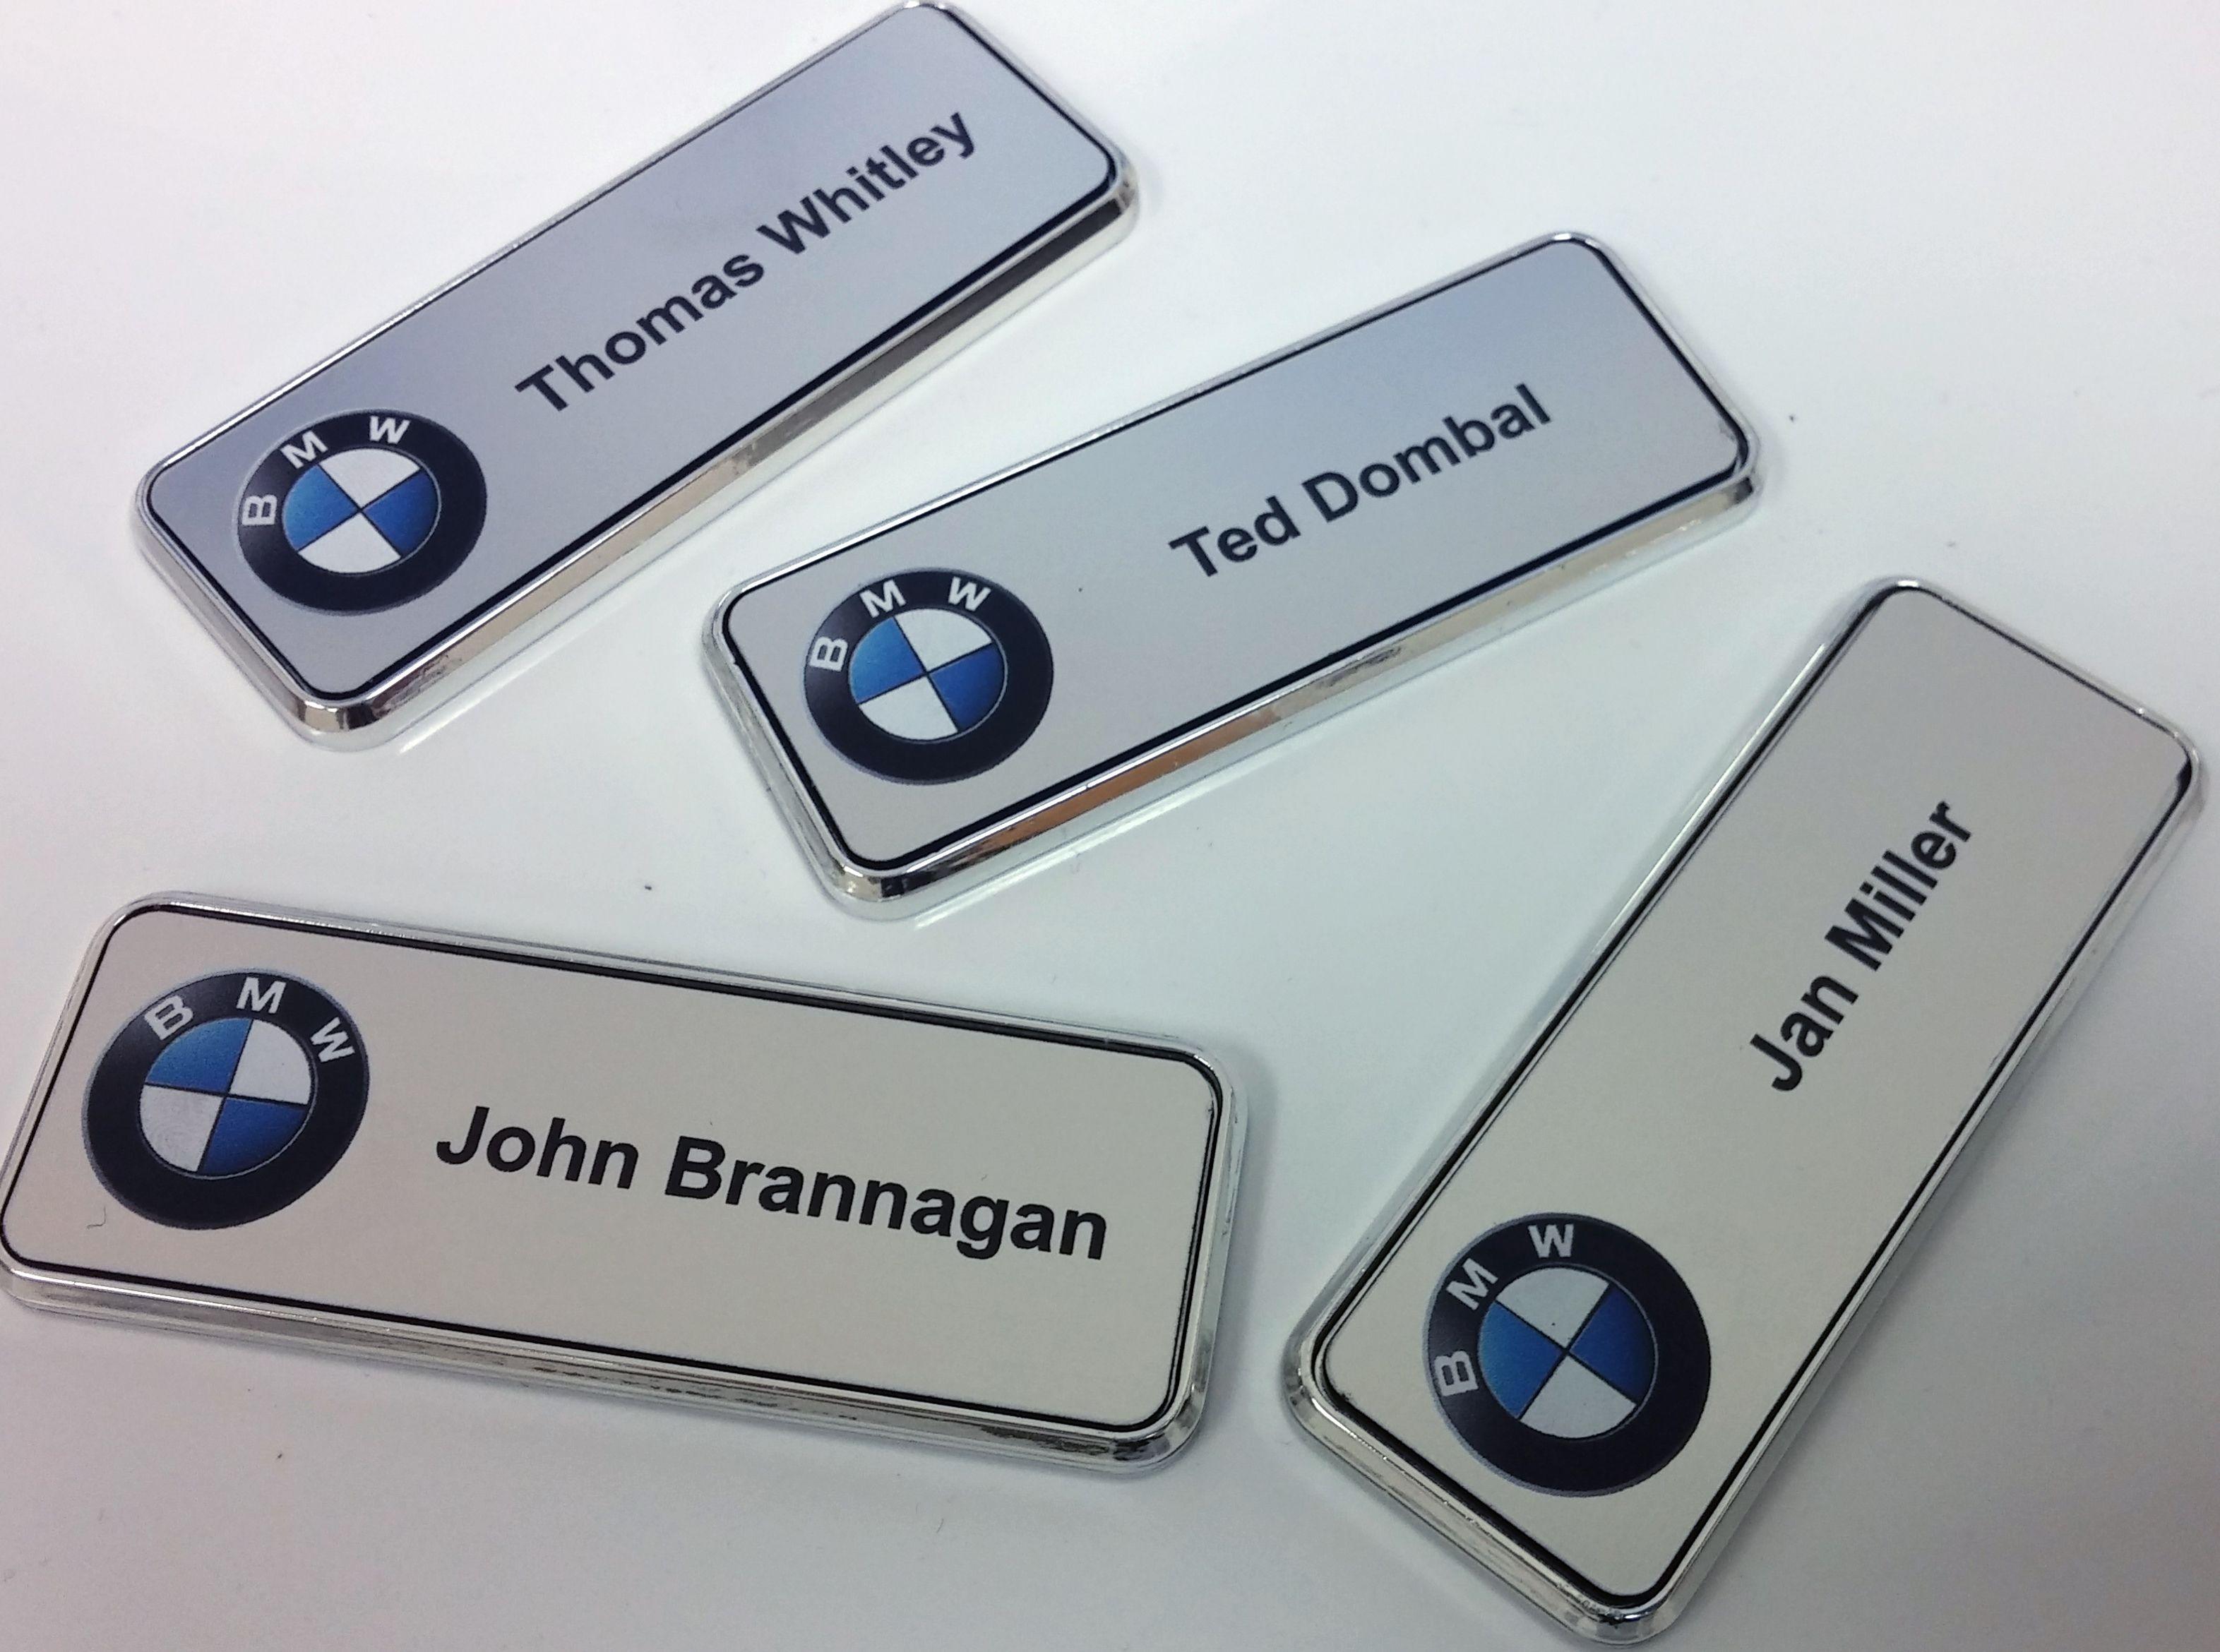 Bmw name badges from namebadge namebadge nametags bmw silver bmw name badges from namebadge namebadge nametags bmw silver solutioingenieria Choice Image